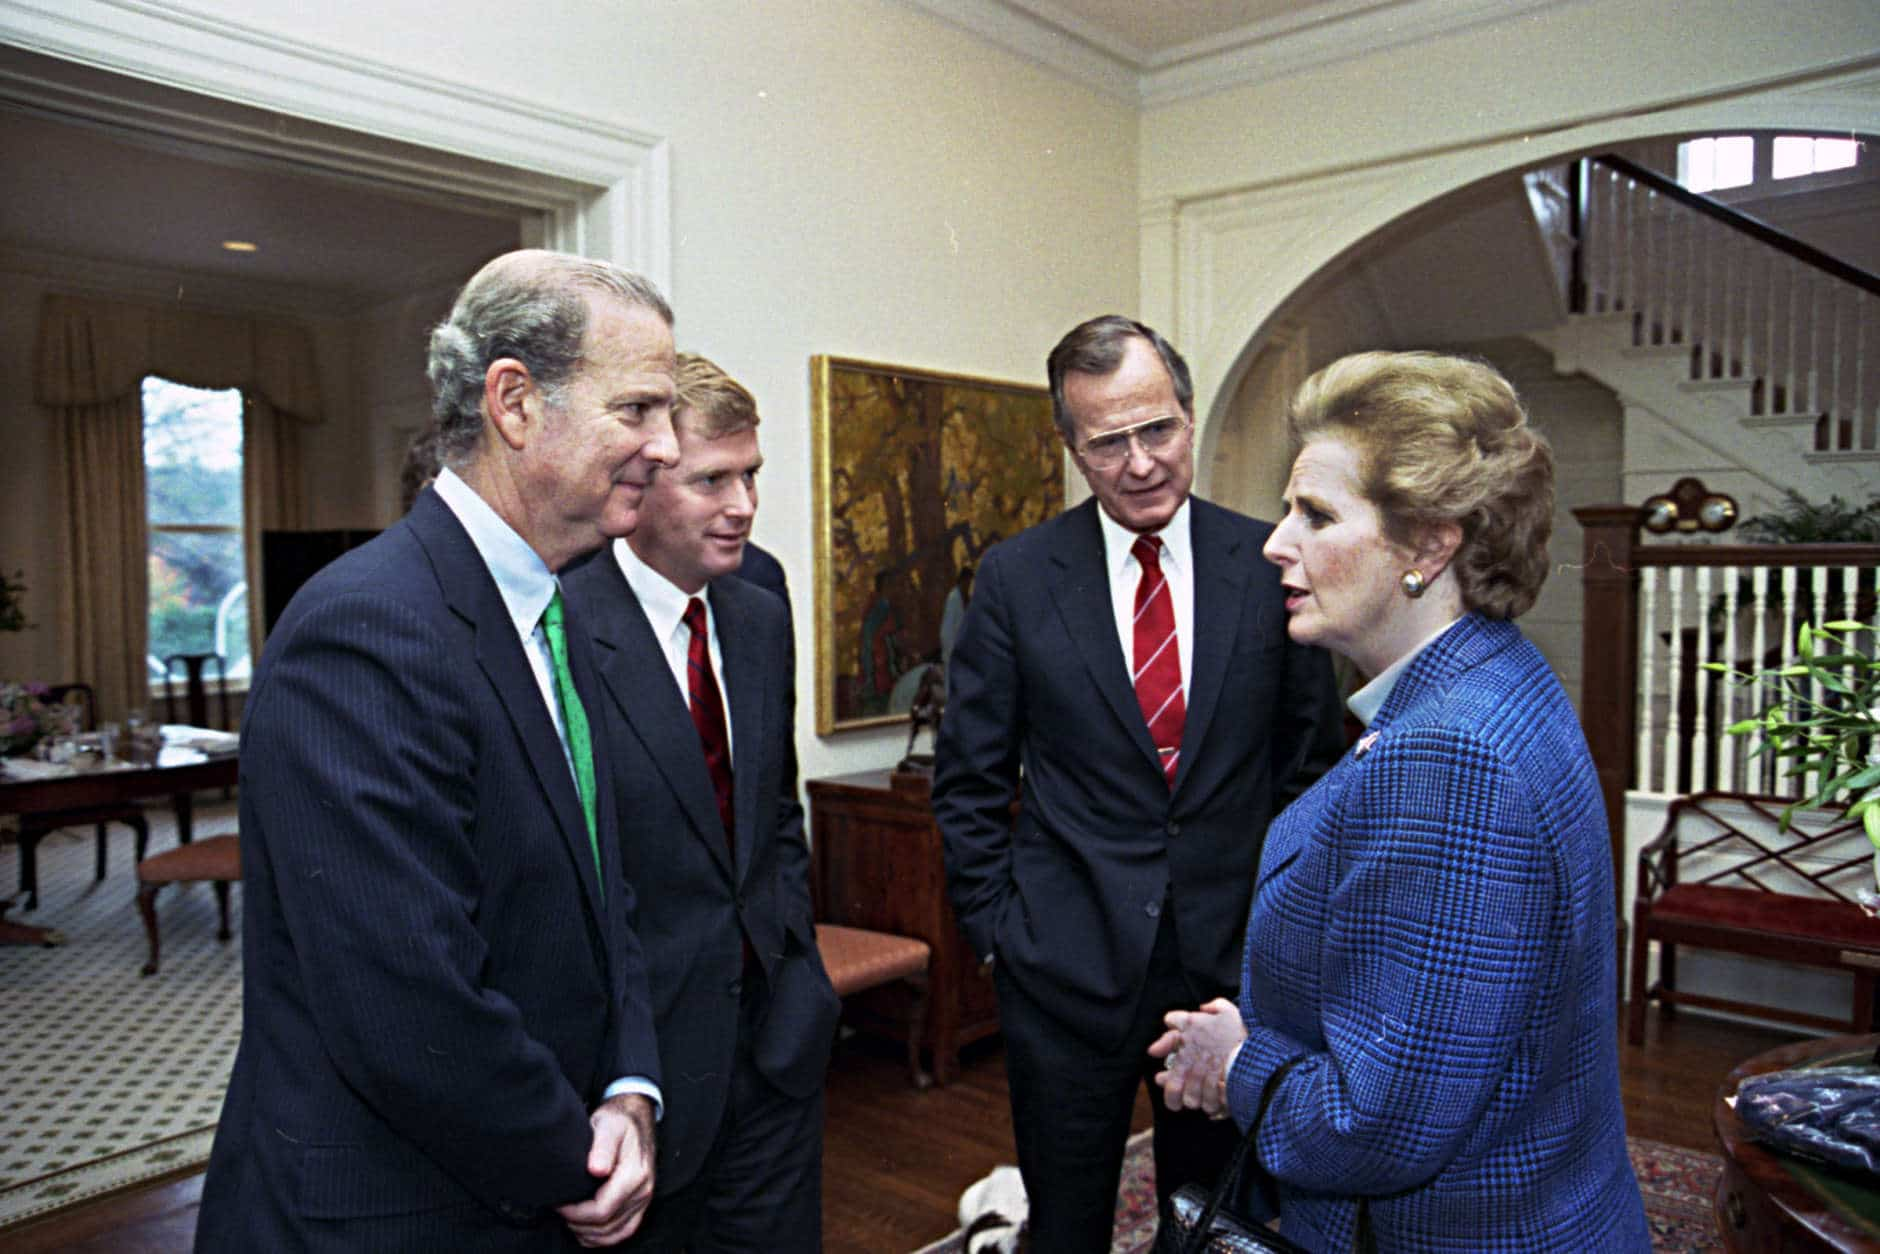 G23234-05  President-elect Bush meets with British Prime Minister Margaret Thatcher at the Vice President's residence. 17 November 1988 Photo credit:  David Valdez